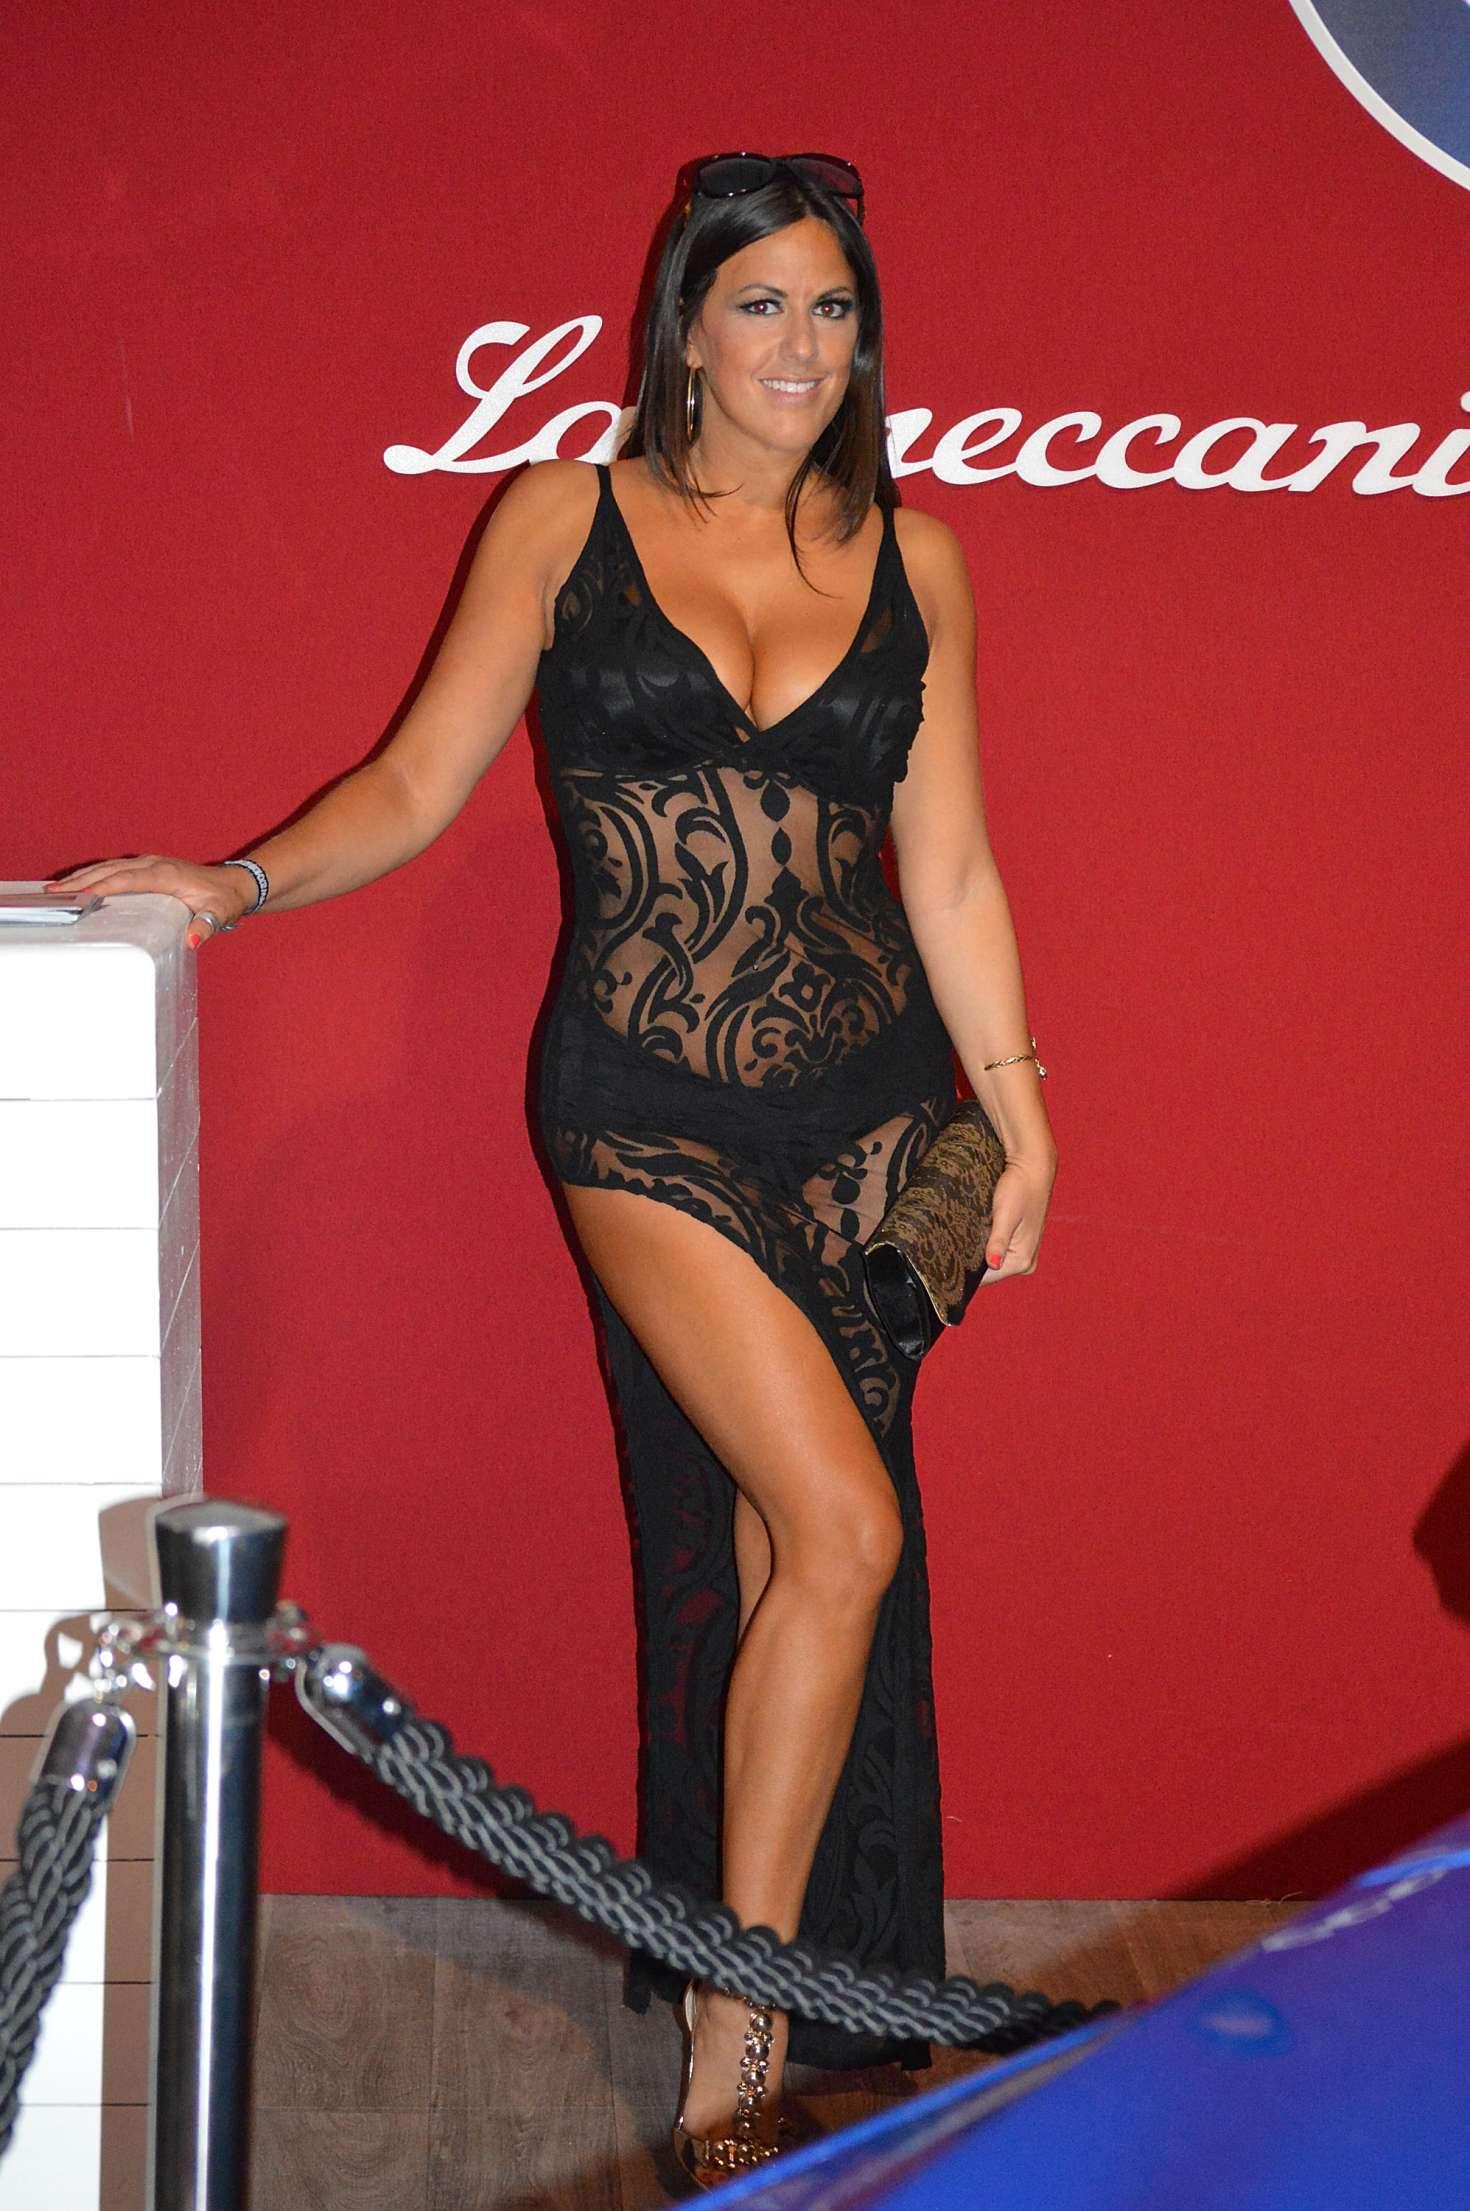 Snapchat Claudia Romani naked (63 foto and video), Pussy, Paparazzi, Boobs, underwear 2020